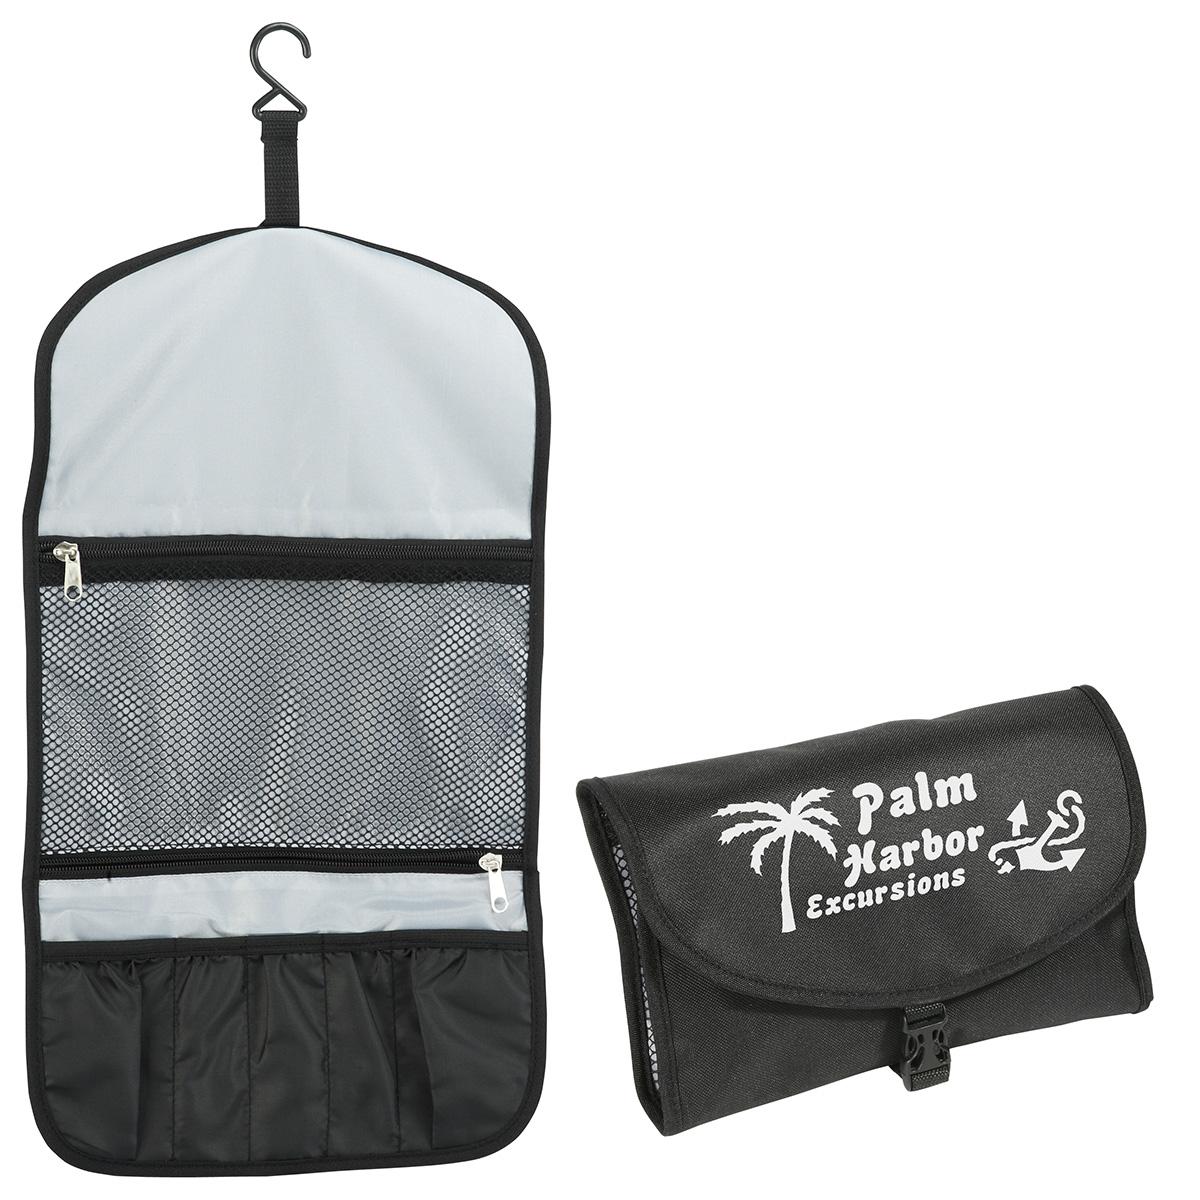 Tradewinds Travel Toiletry Bag, WBA-TB10, 1 Colour Imprint